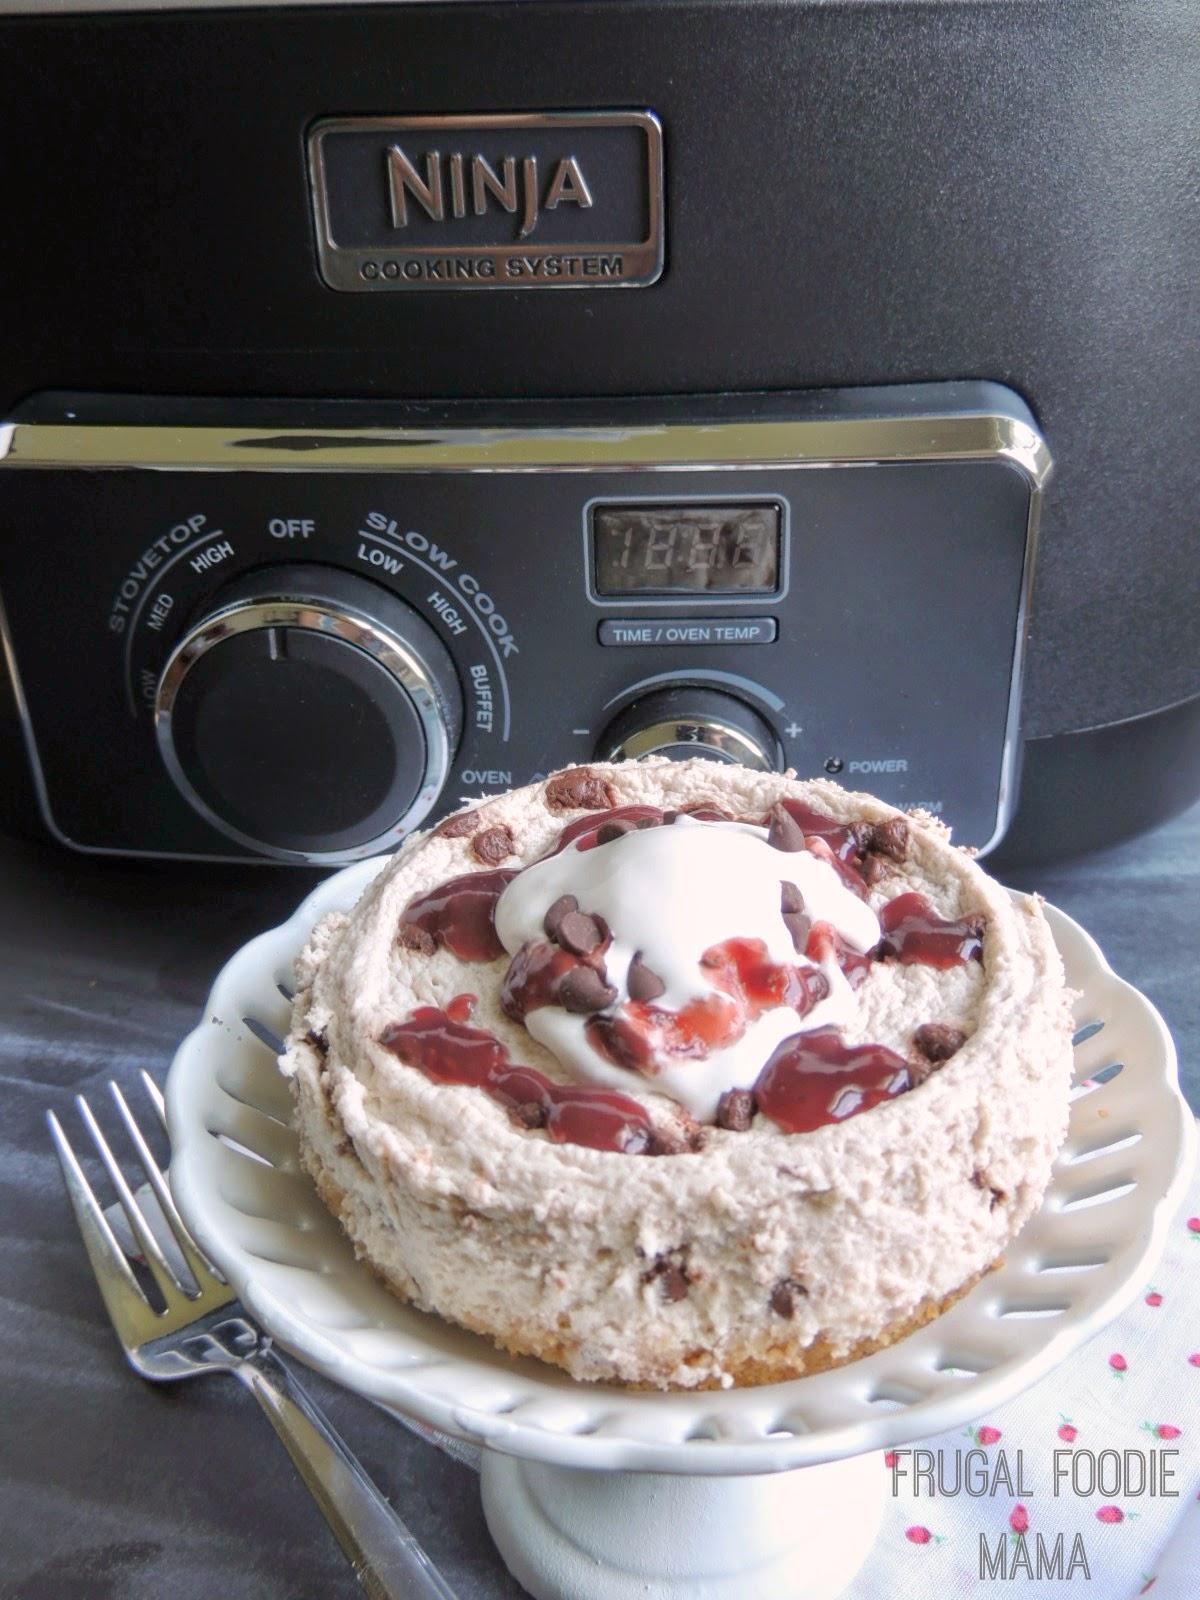 Mini Raspberry Chocolate Chip Cheesecakes via thefrugalfoodiemama.com #skinnydessert #lowfat #Greekyogurt